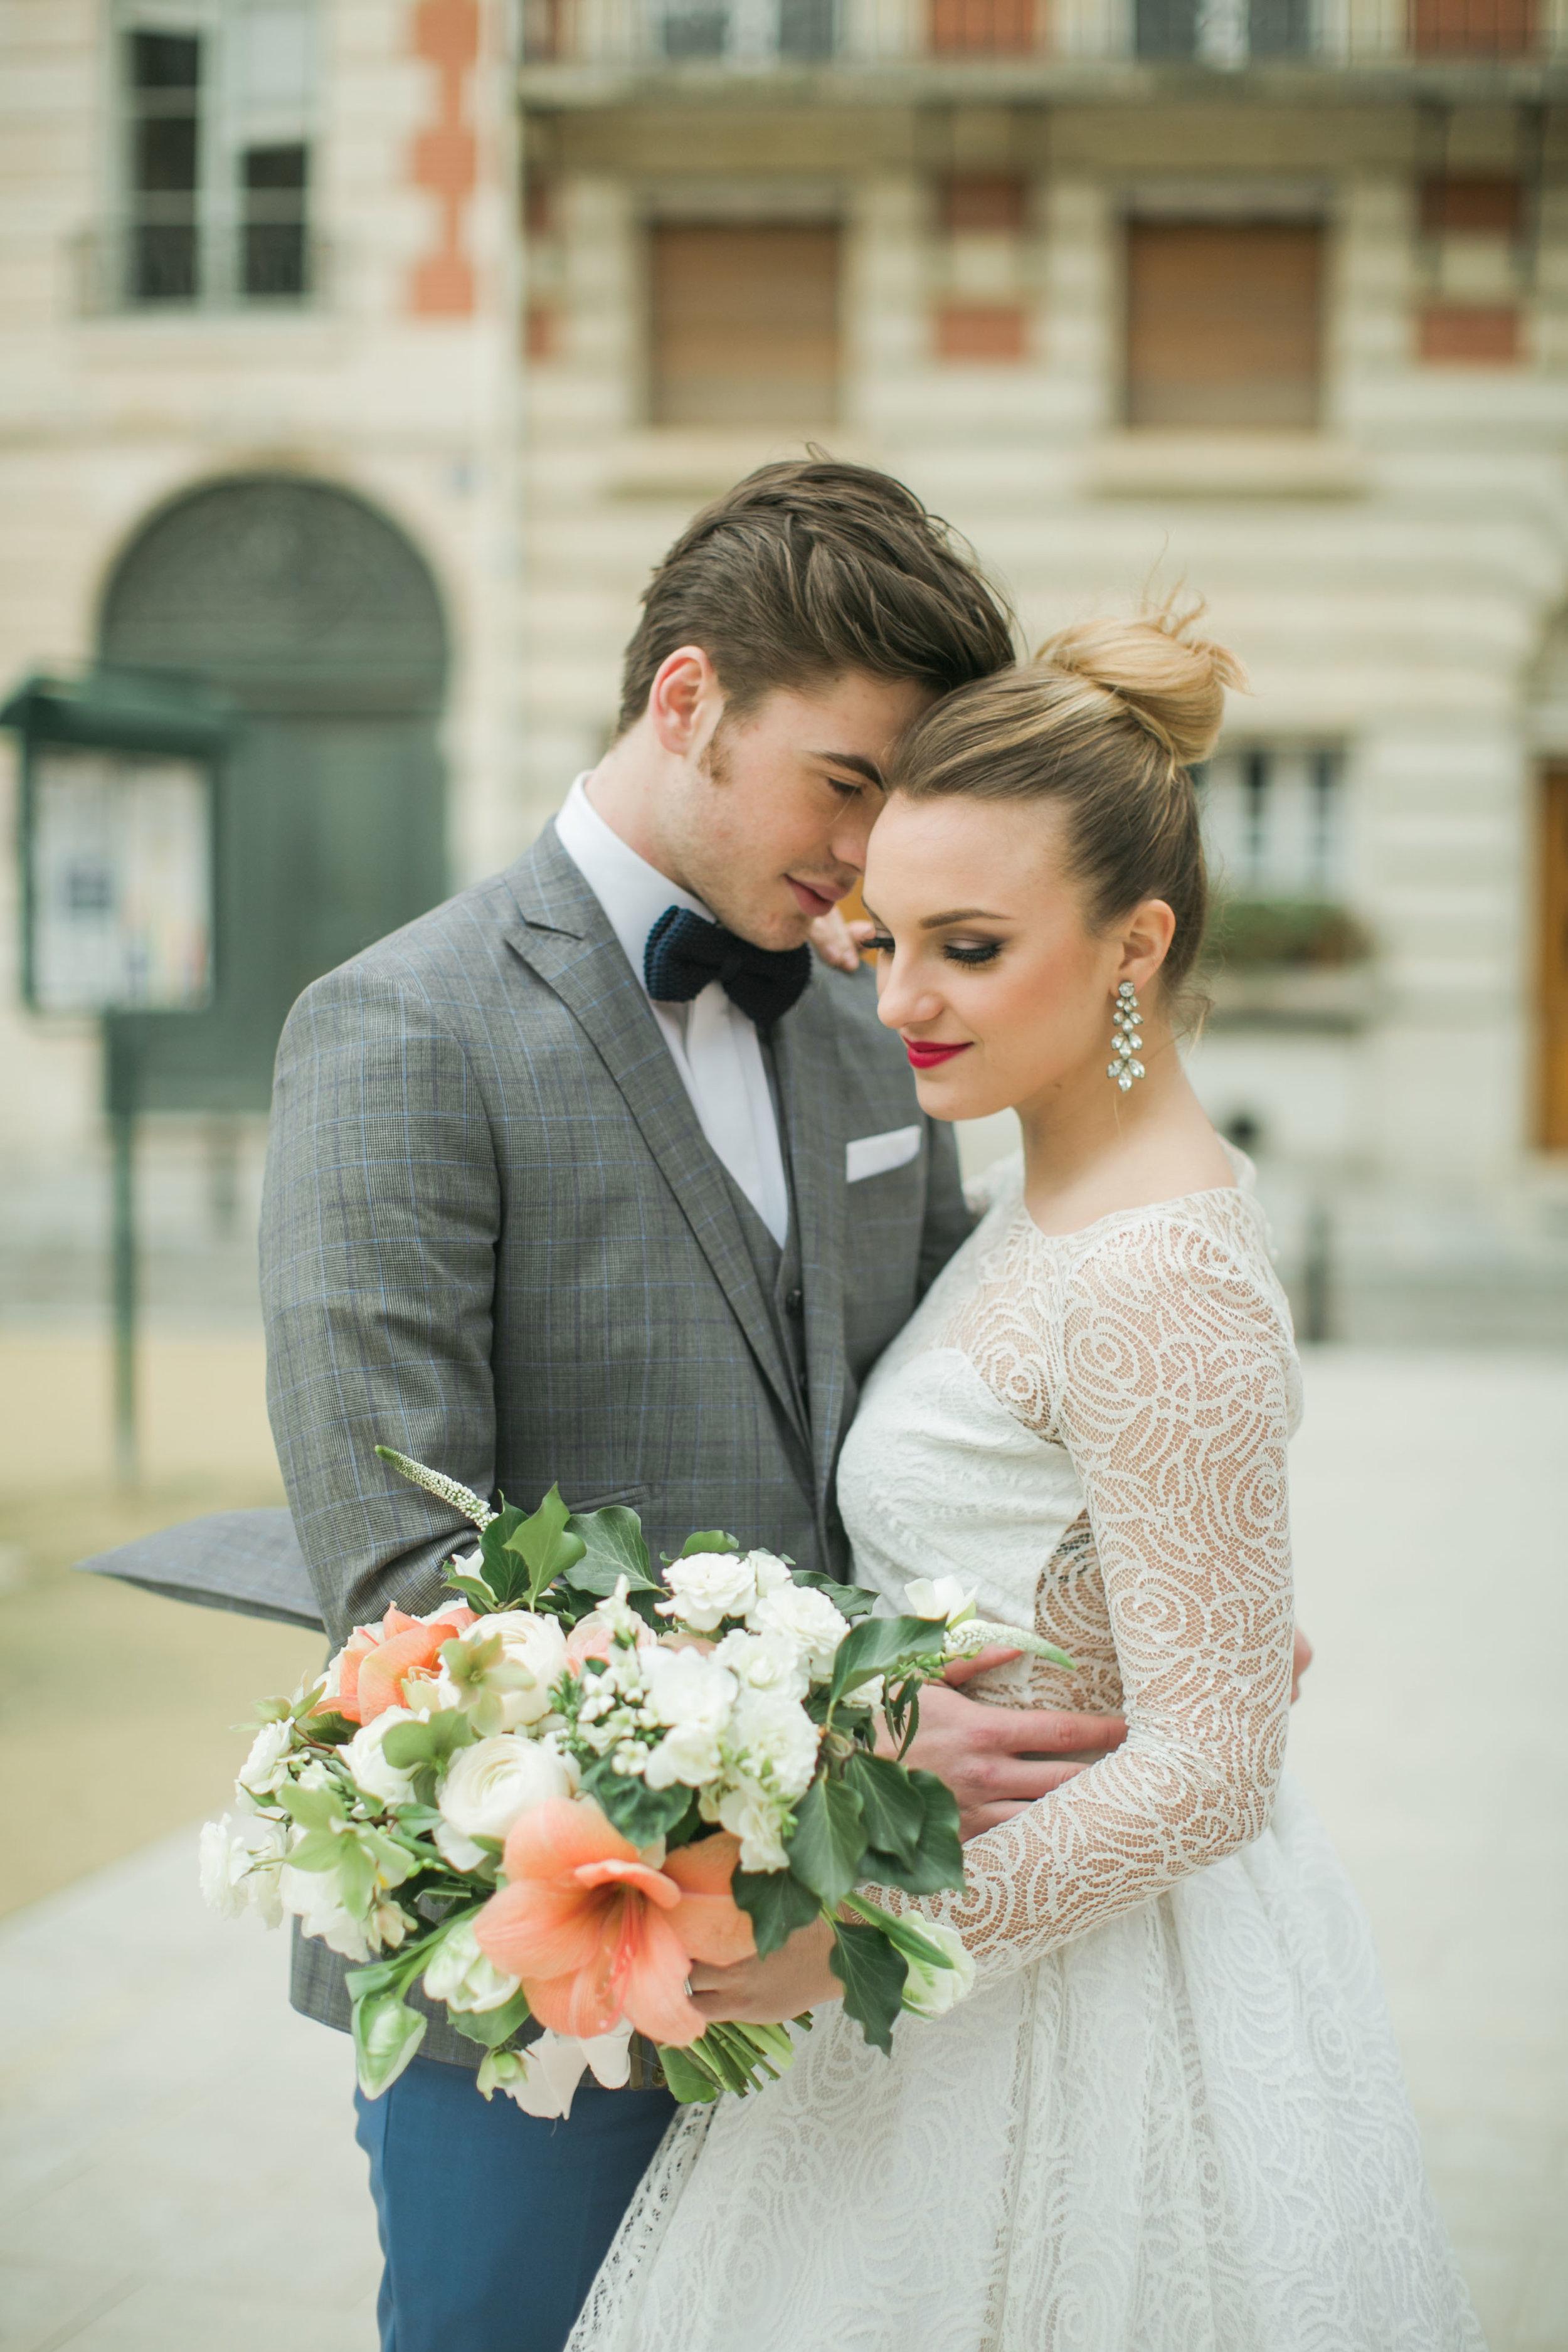 toronto-wedding-photographer-richelle-hunter-photography-new-york-paris-france-inspiration-2.jpg